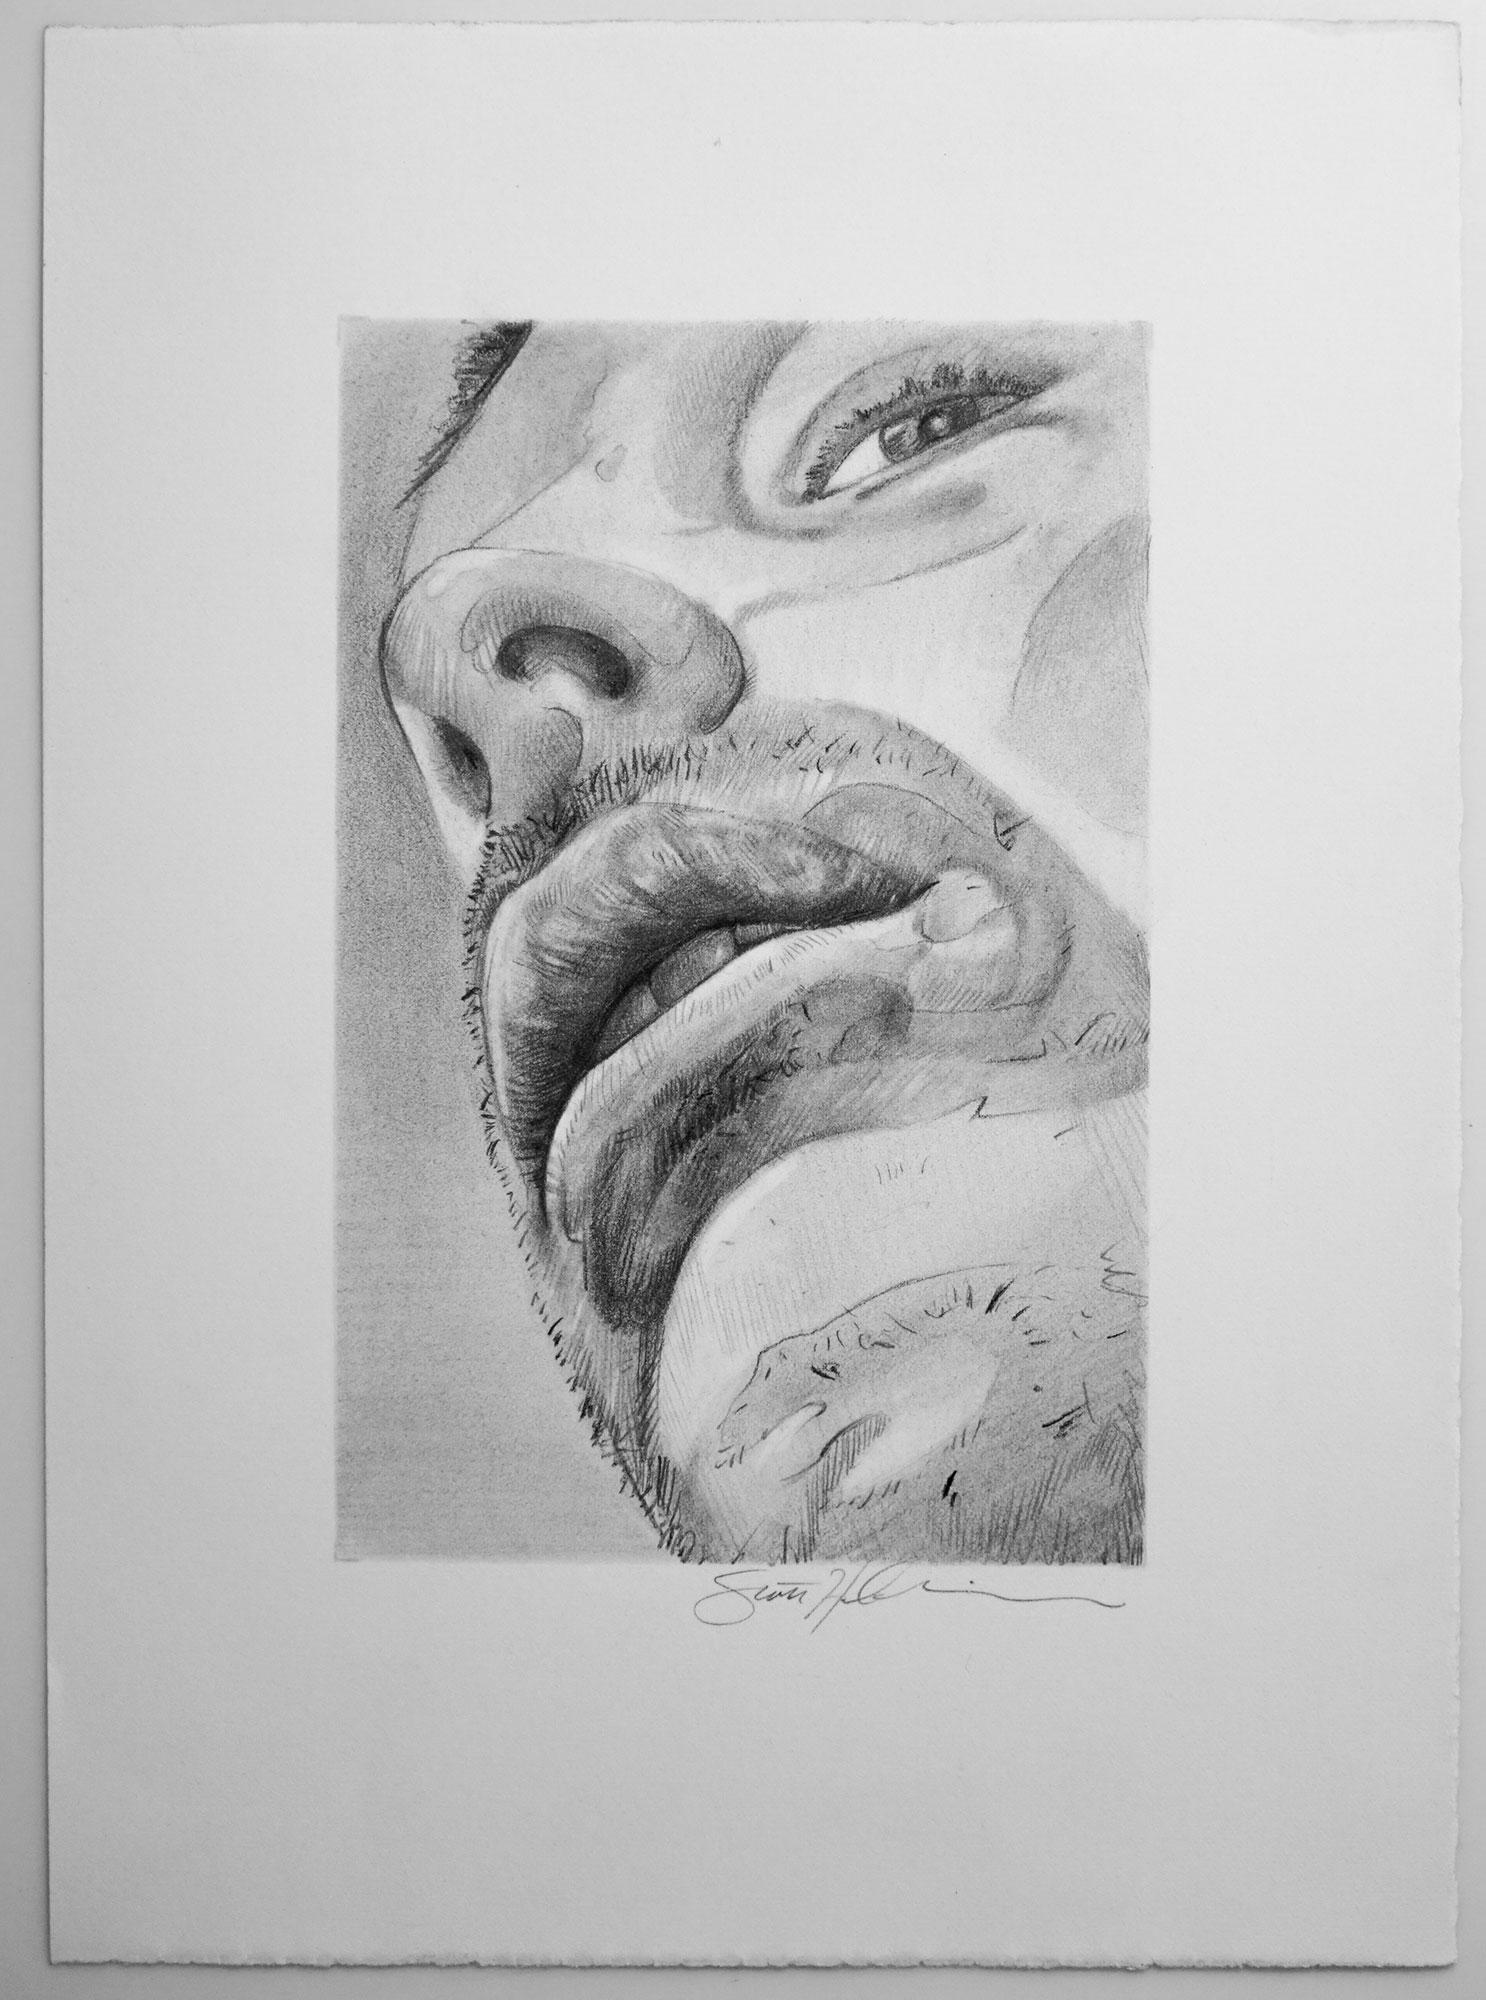 A Self Portrait Study by Scott Hutchison titled Waiting To Speak